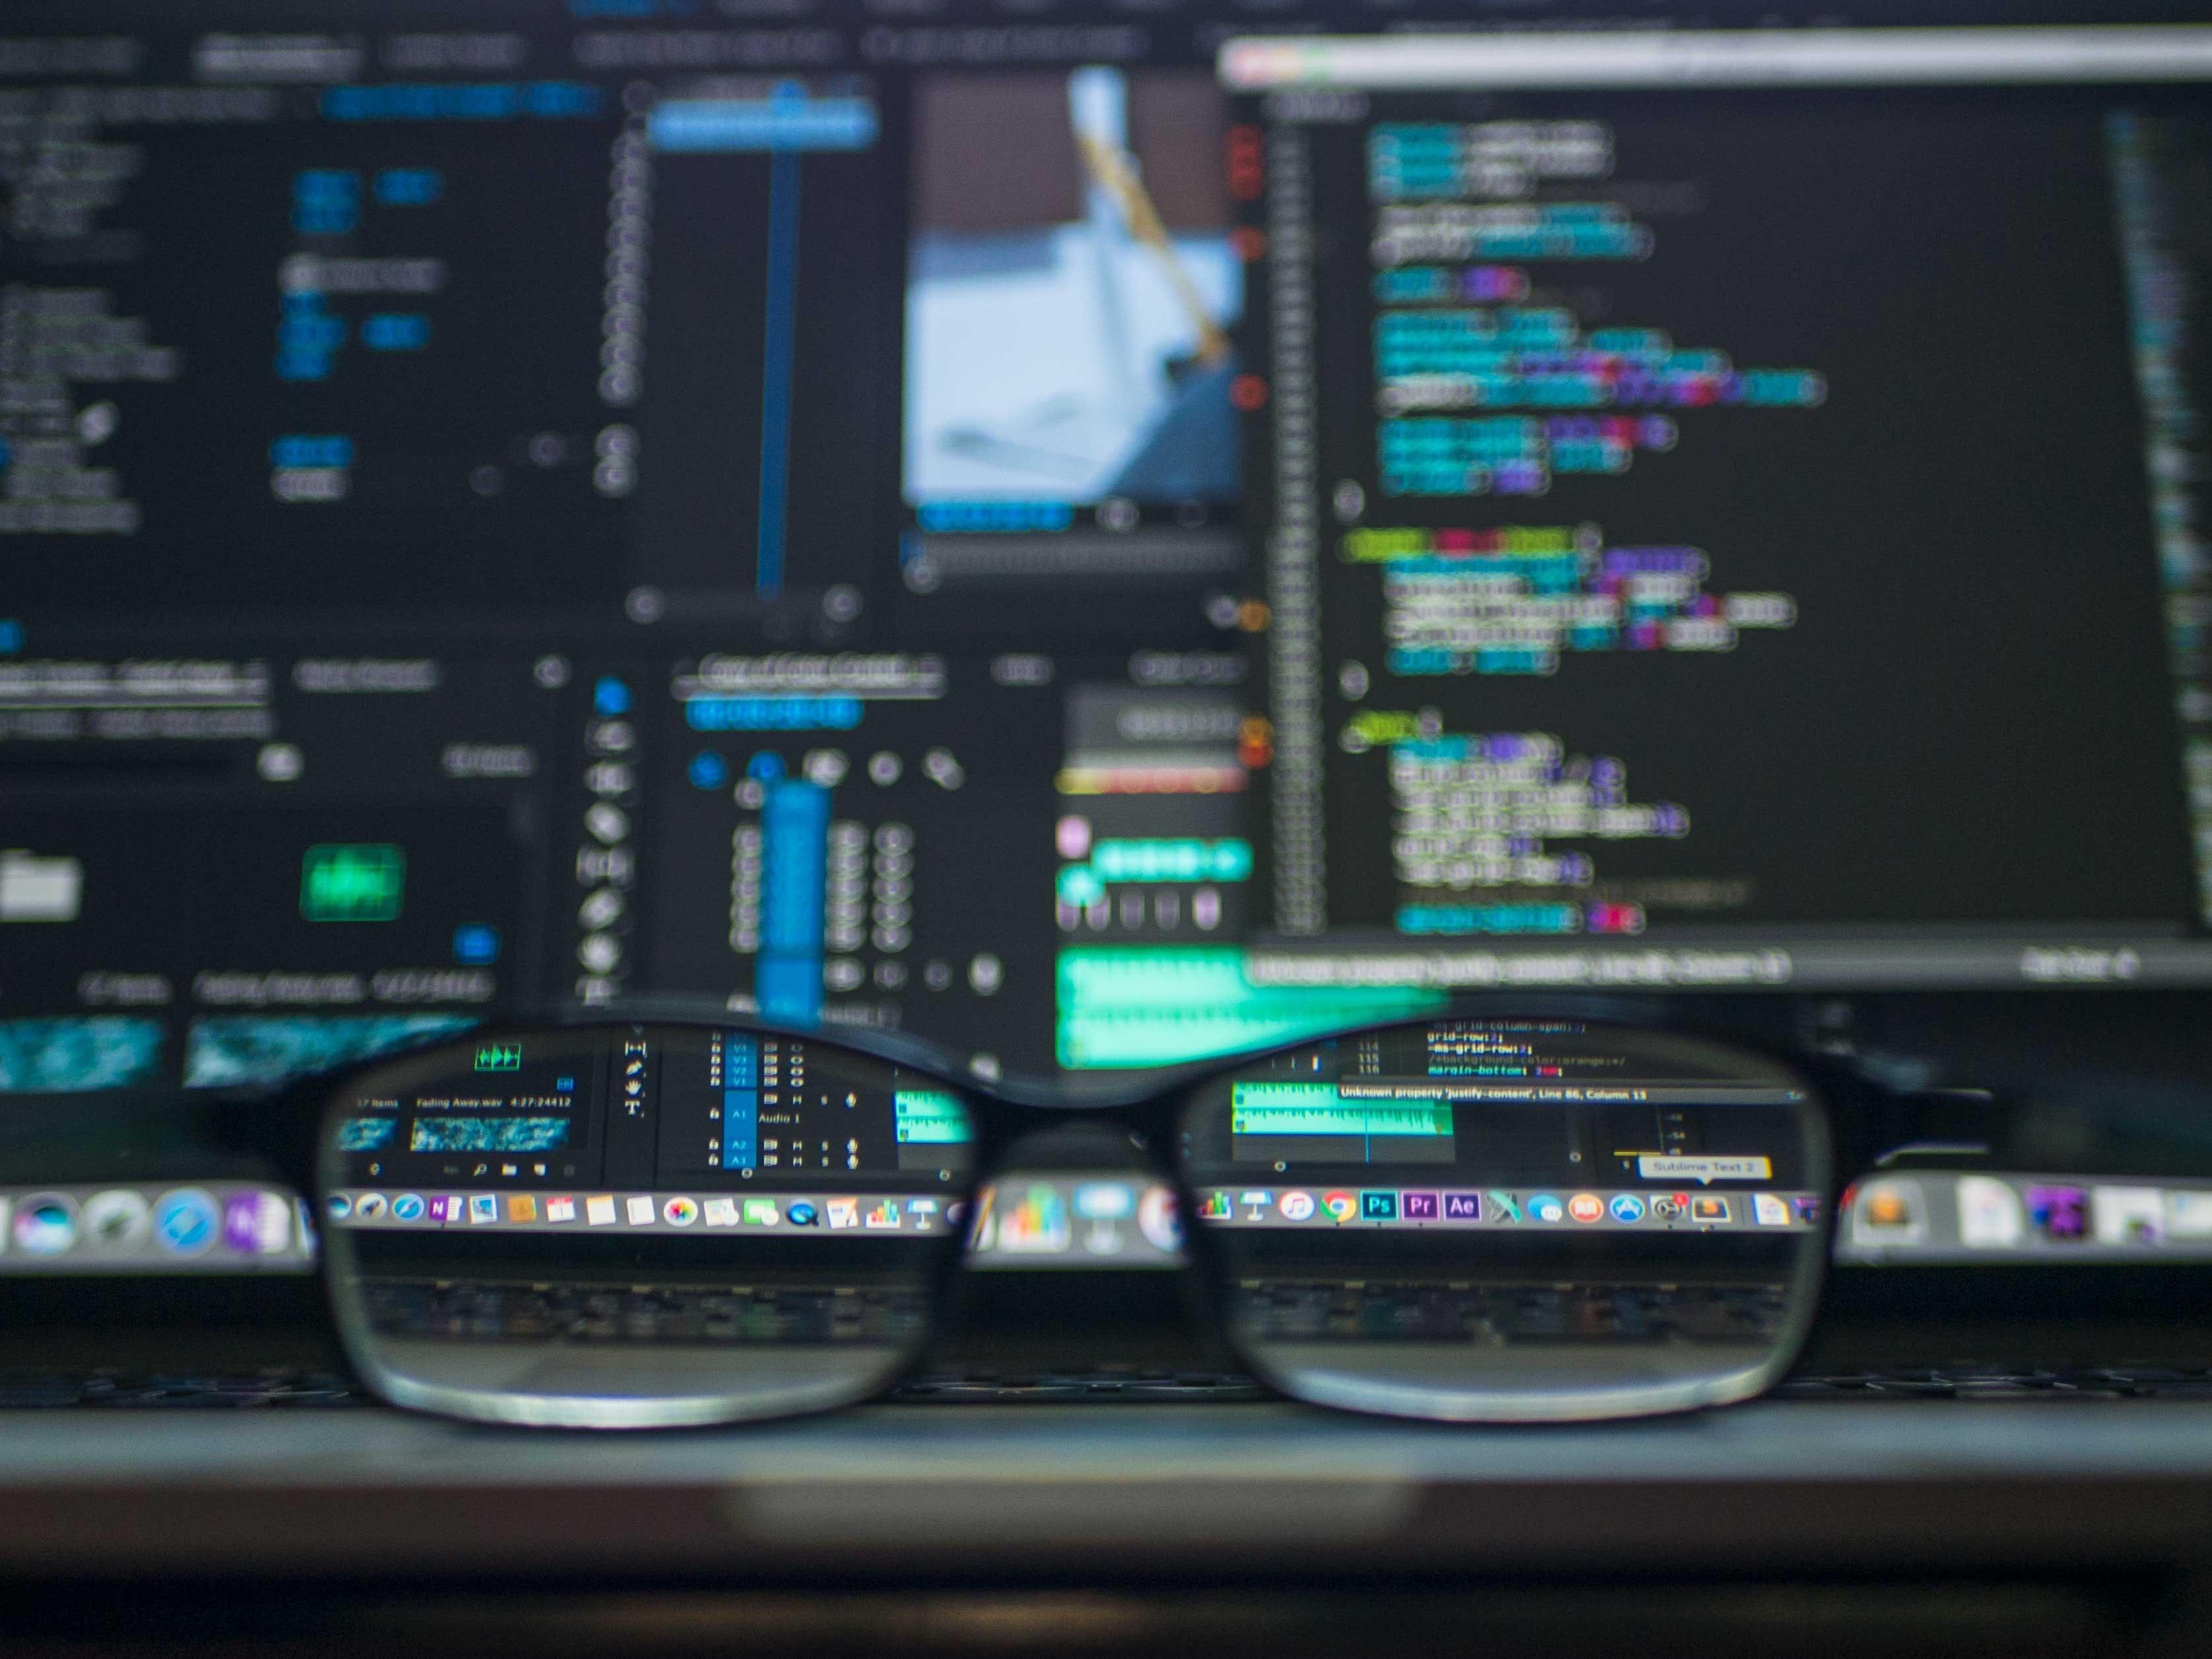 RIG Exploit Kit Download 2018 | RIG Exploit Kit Analysis